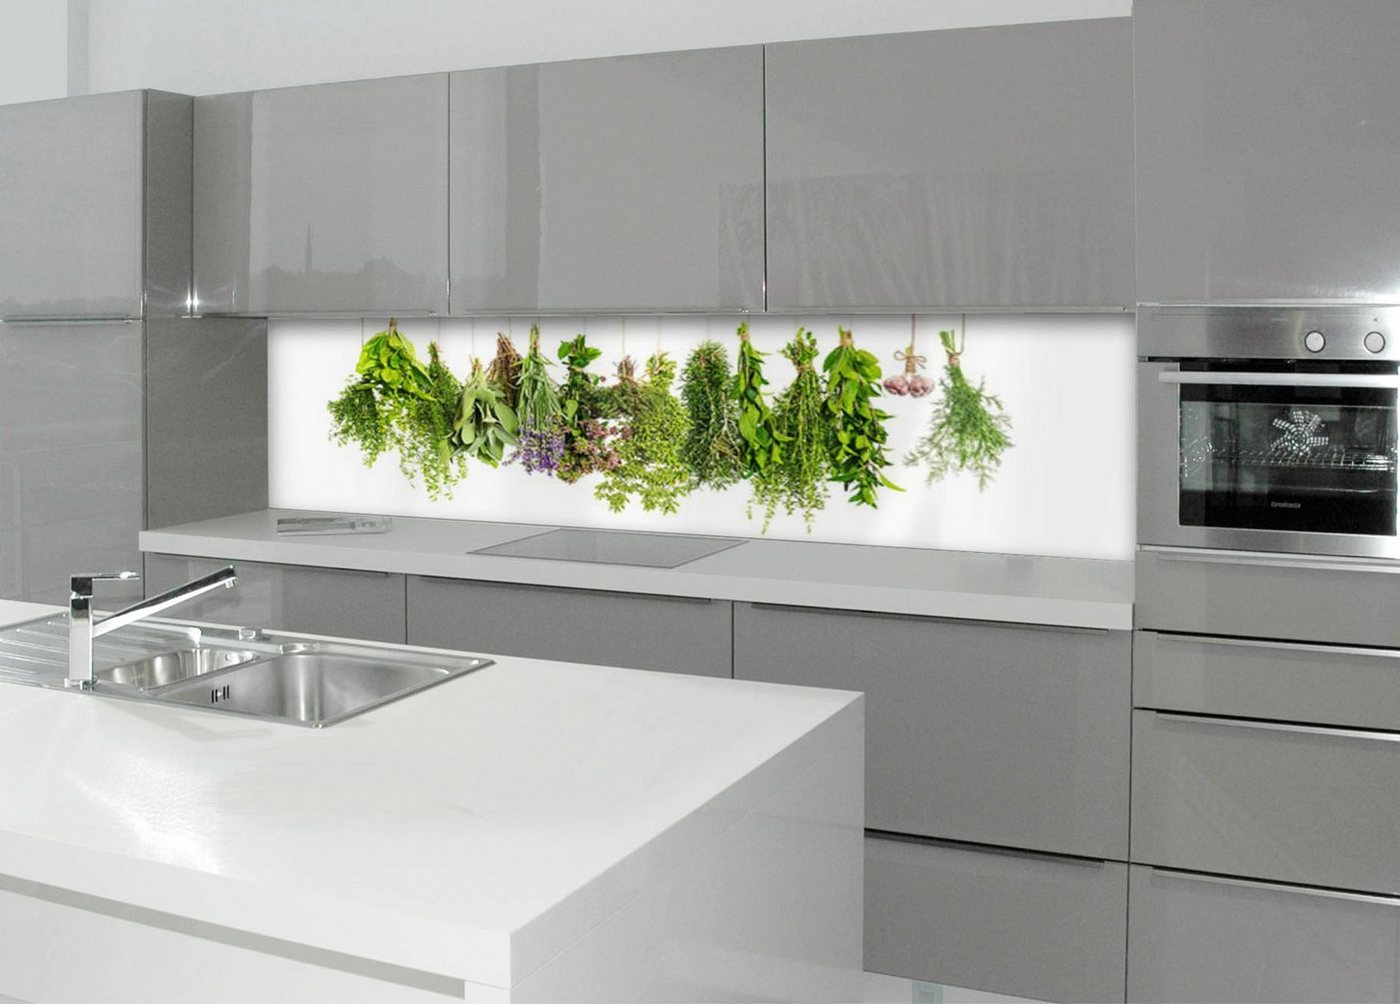 Küchenrückwand - Spritzschutz »profix«, Kräuterleine, 220x60 cm